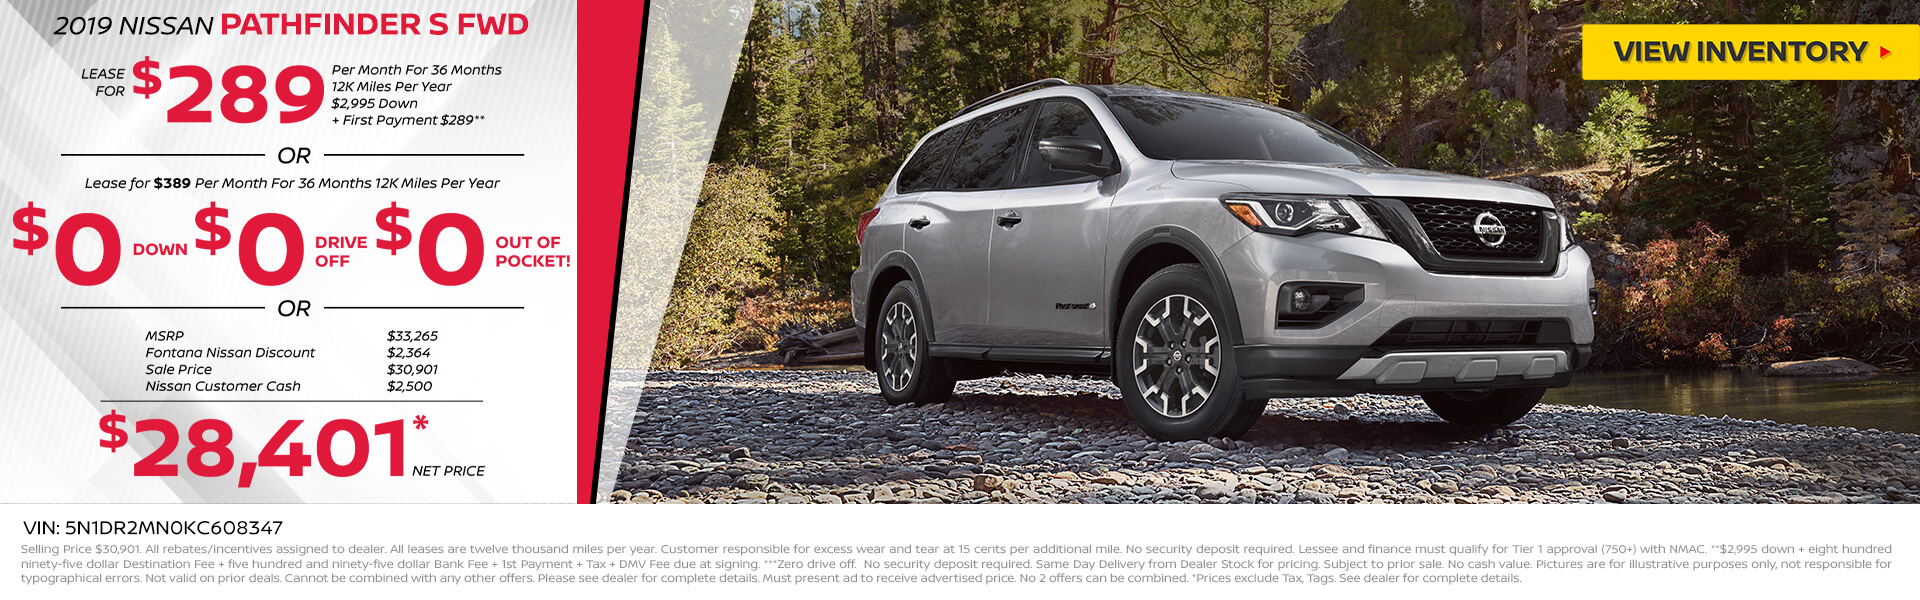 Nissan Pathfinder $389 Lease